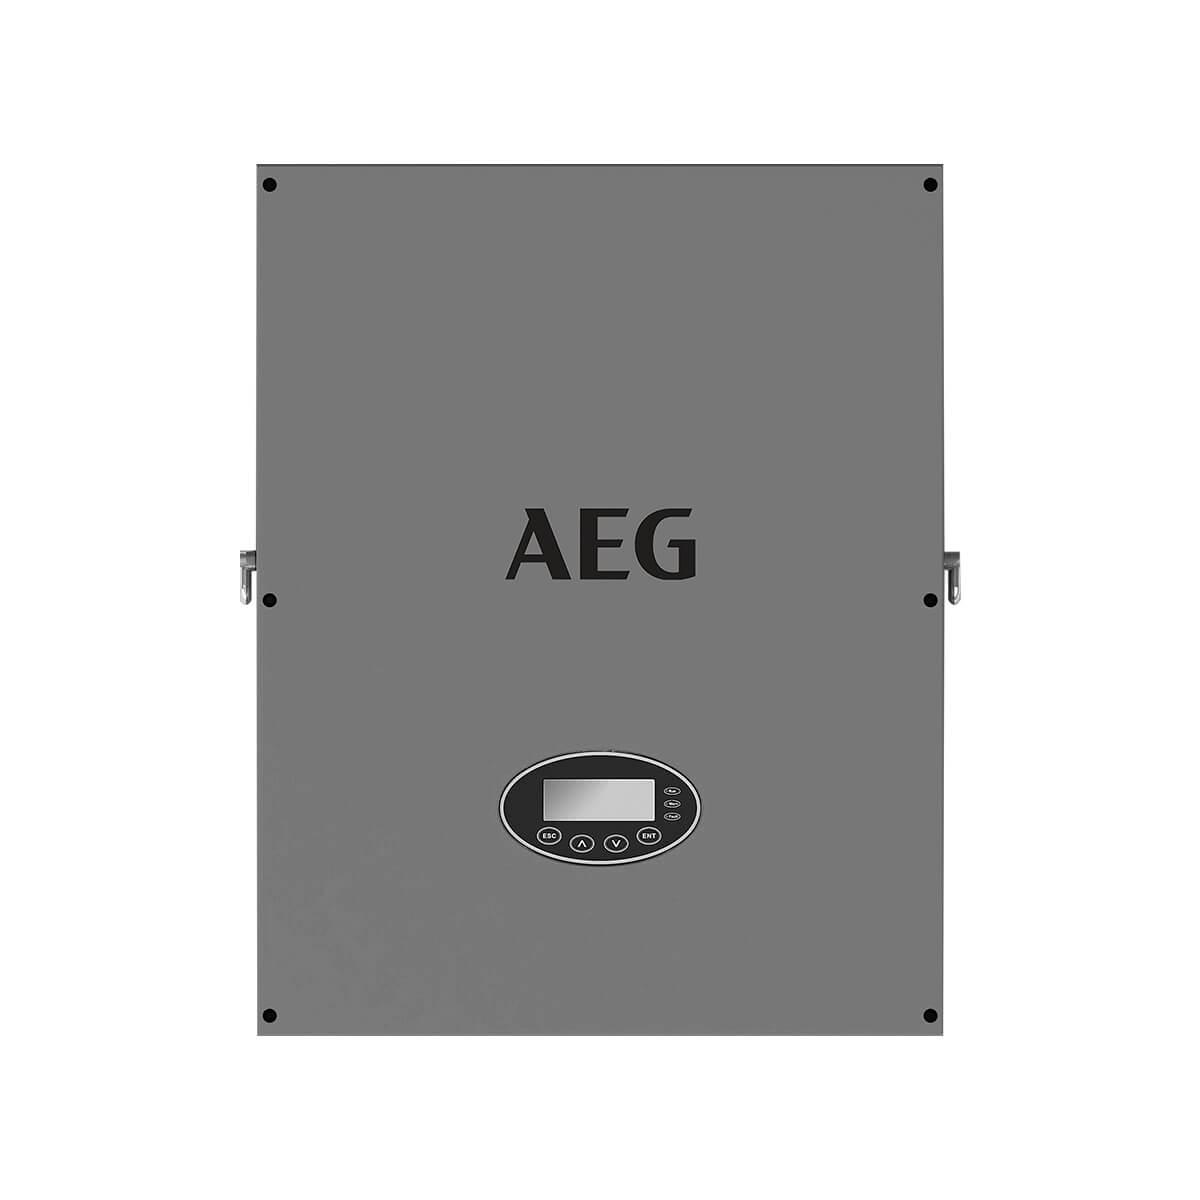 aeg 20kW inverter, aeg as-ic01 20kW inverter, aeg as-ic01-20000-2 inverter, aeg as-ic01-20000-2, aeg as-ic01 20kW